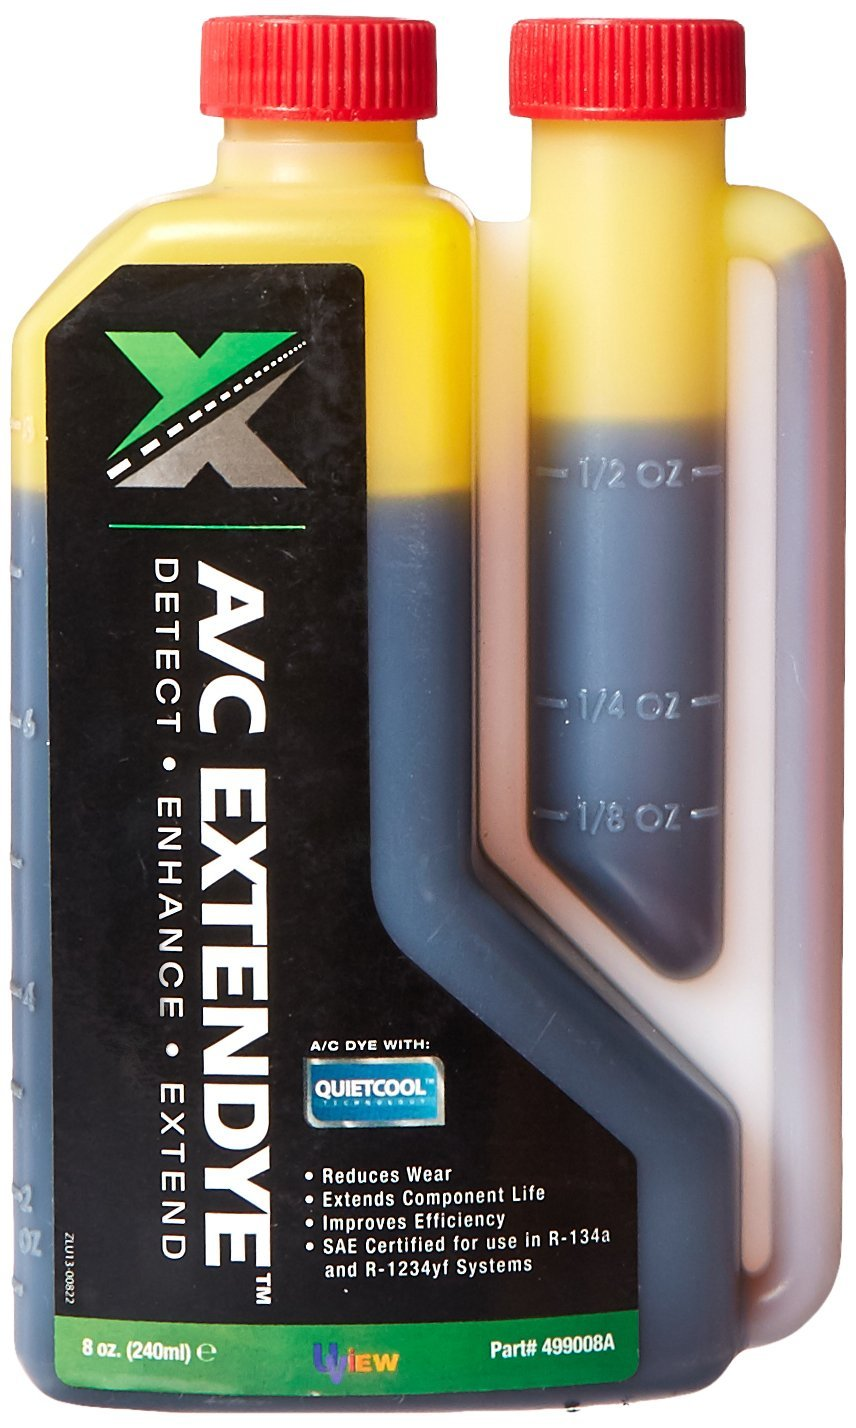 UView 499008A A/C ExtenDye Bottle